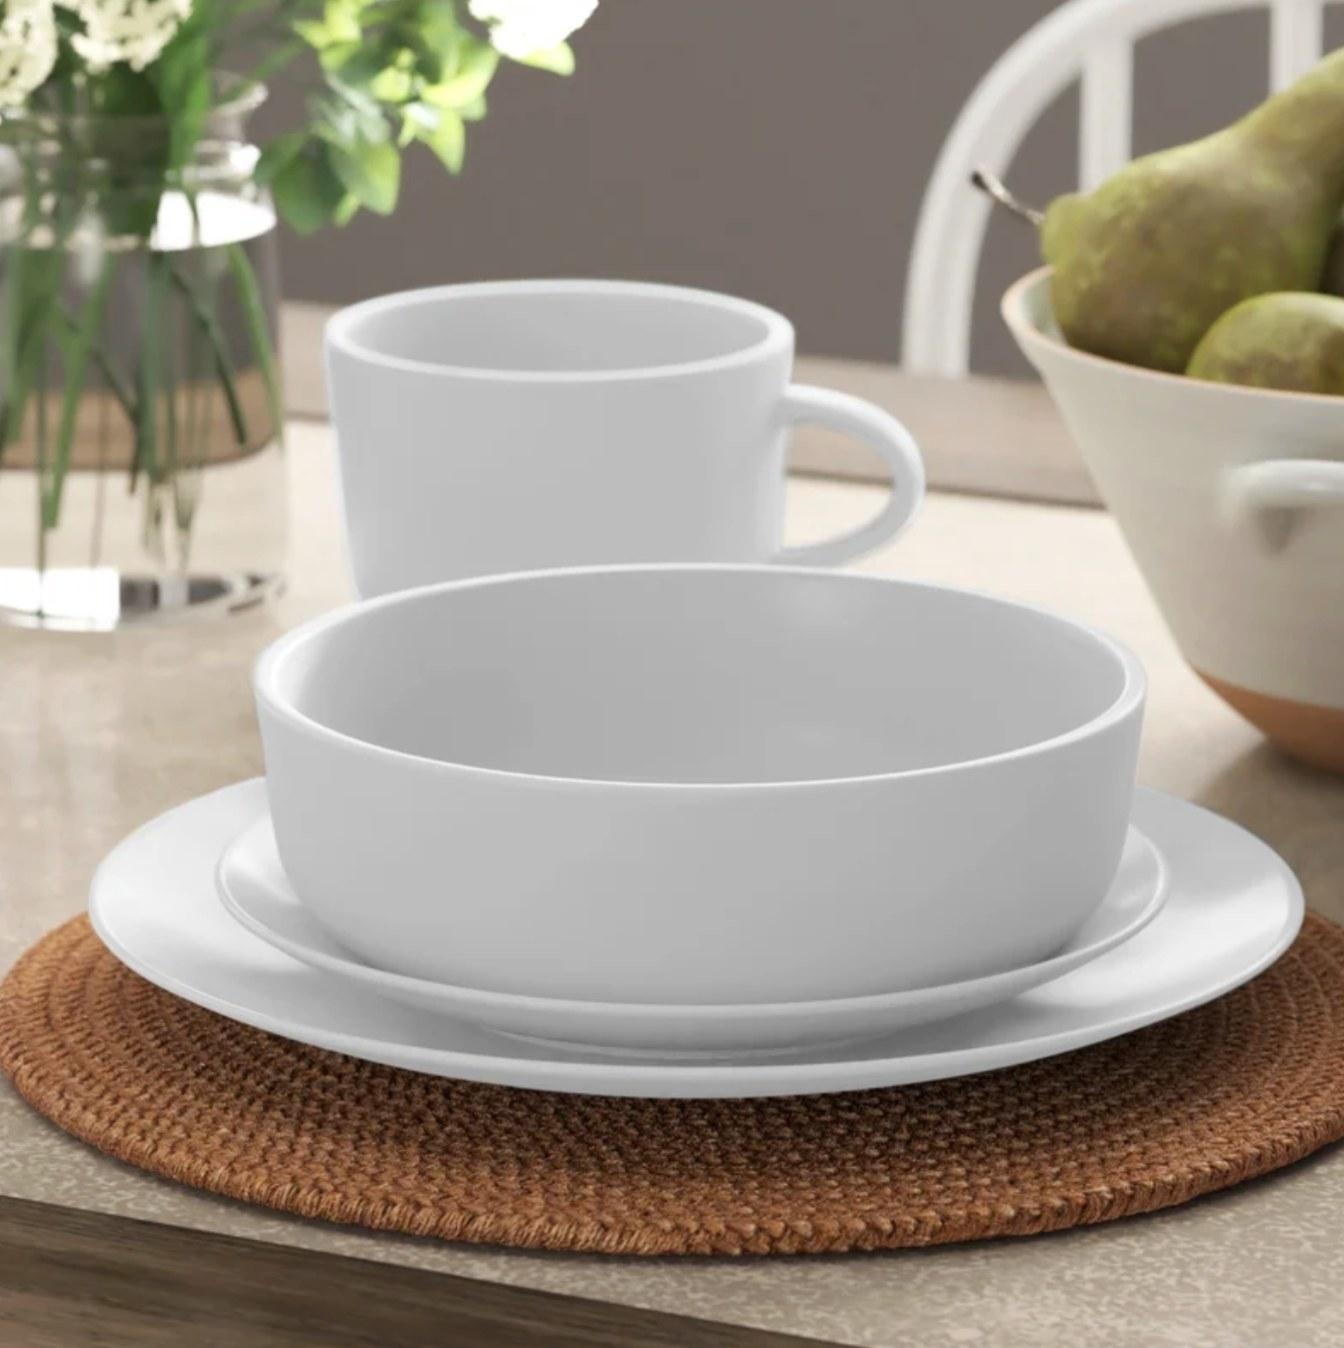 The 16 piece dinnerware set in white